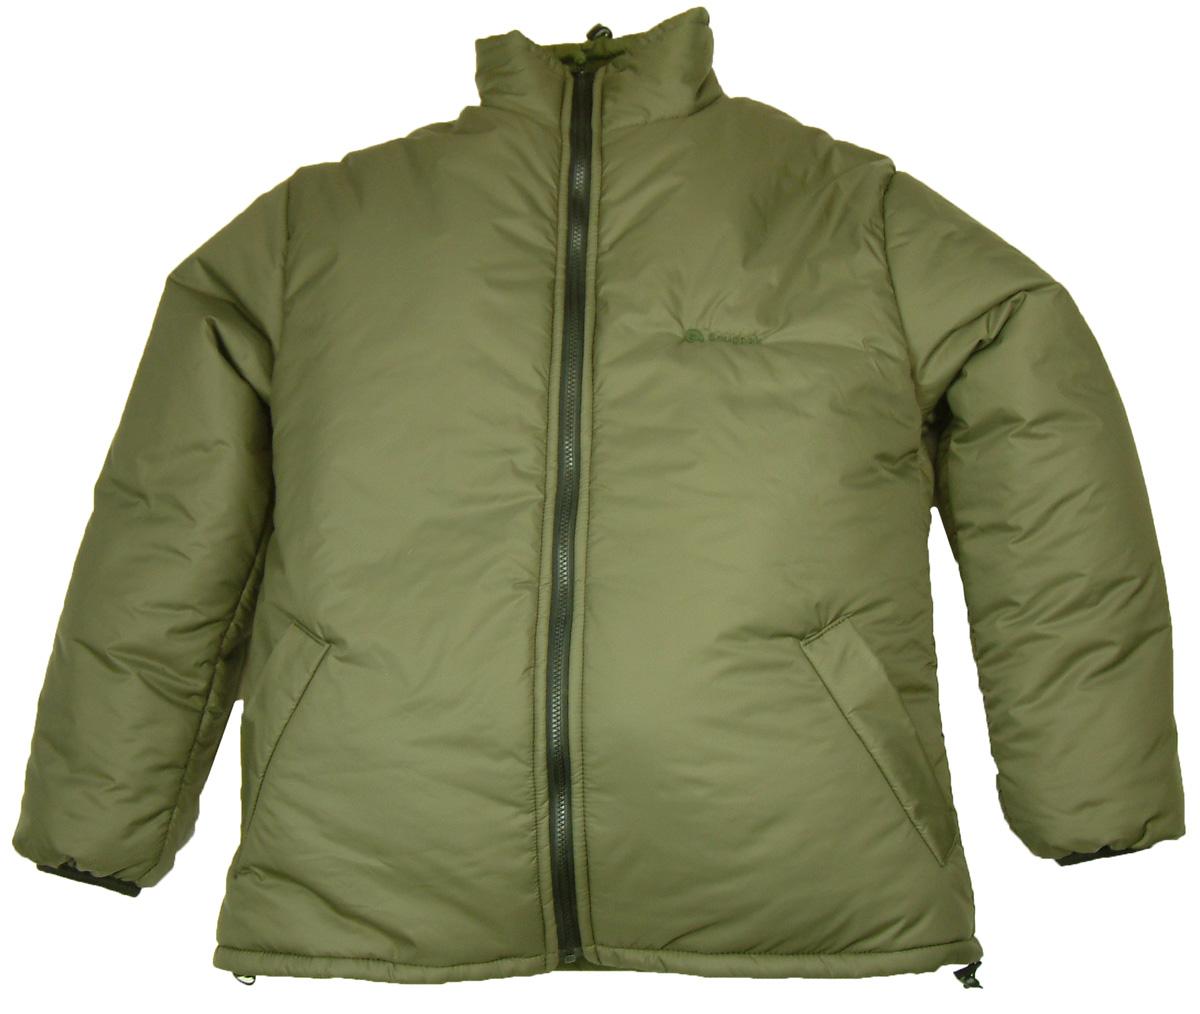 Snugpak Softie Sleeka Original Jacket